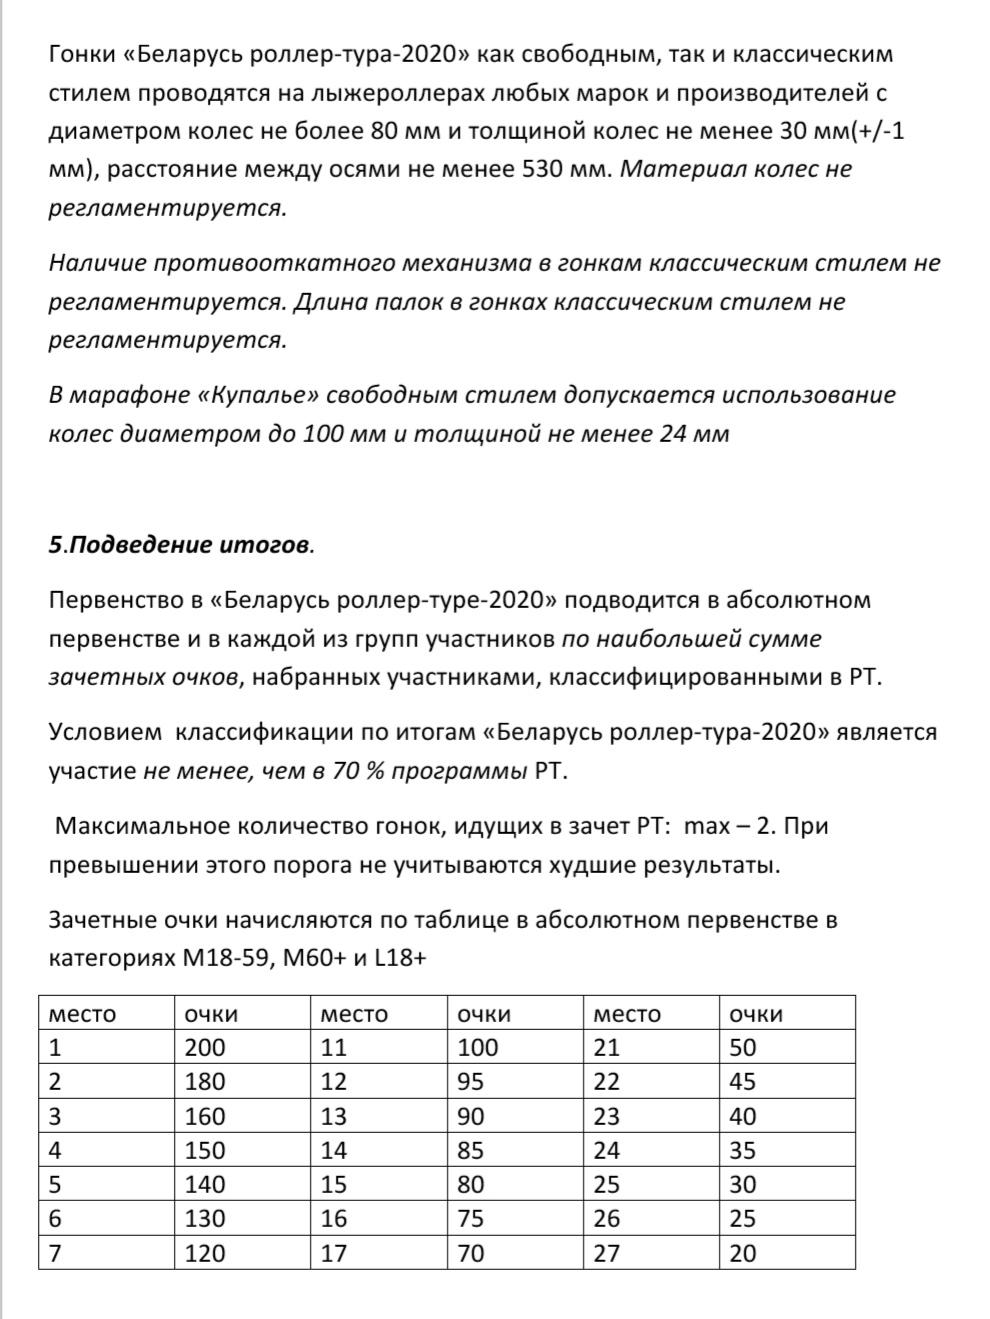 IMG_20200312_183057